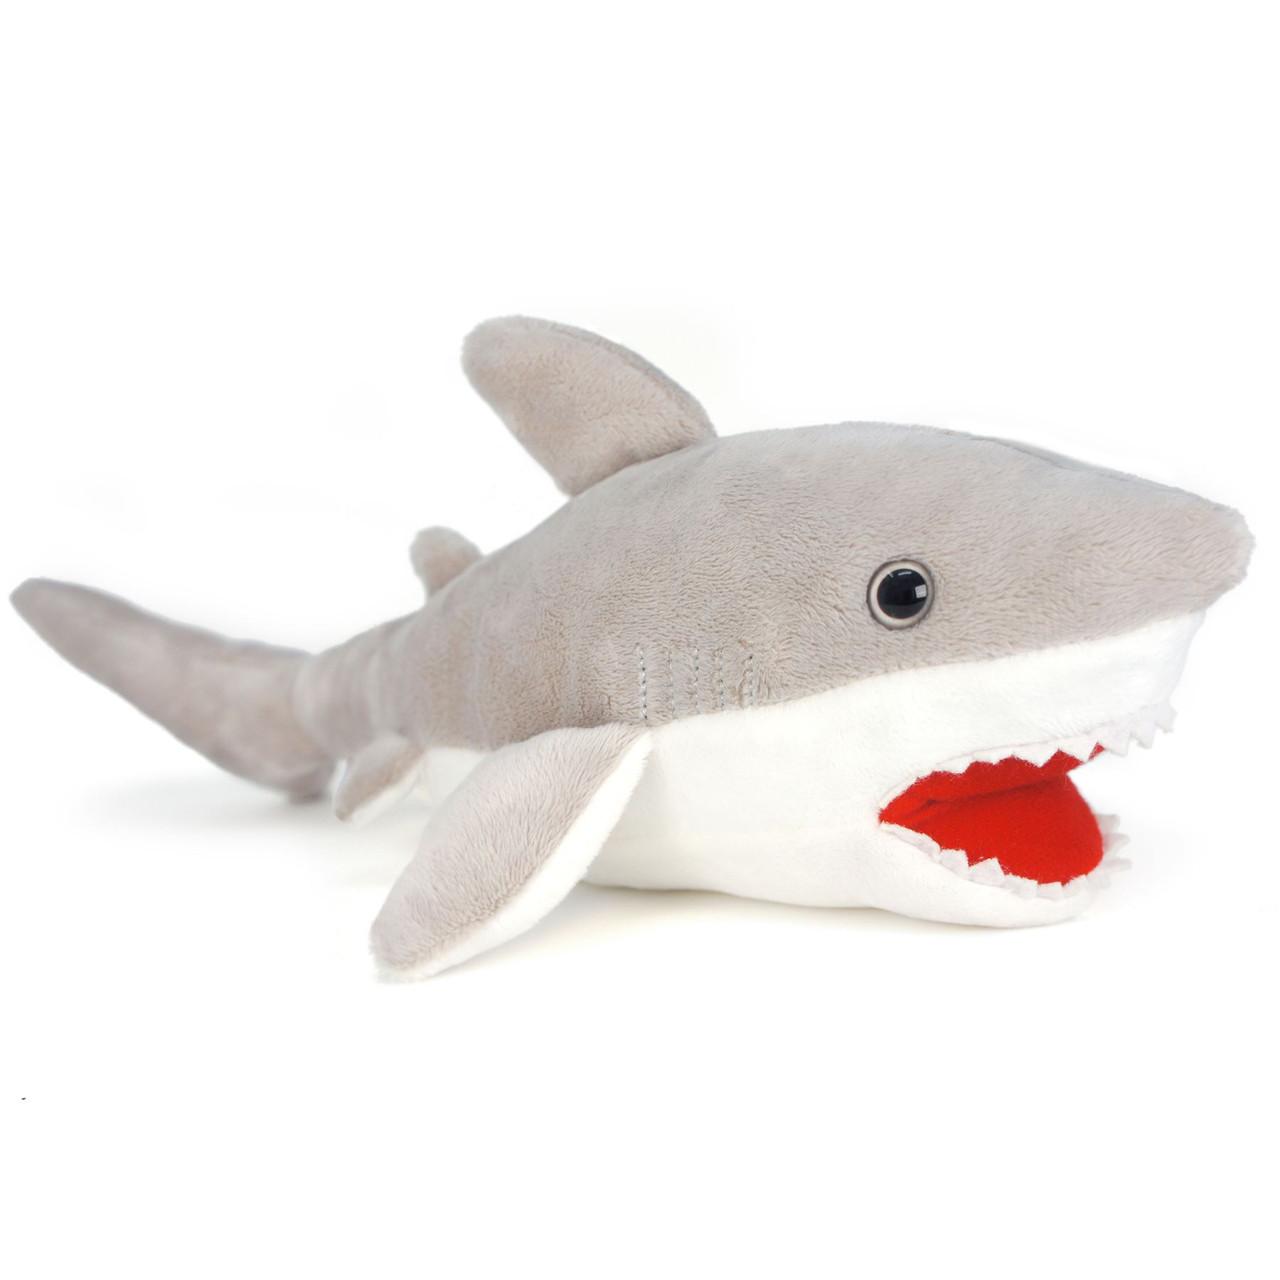 Mason The Great White Shark 16 Inch Large Stuffed Animal Plush